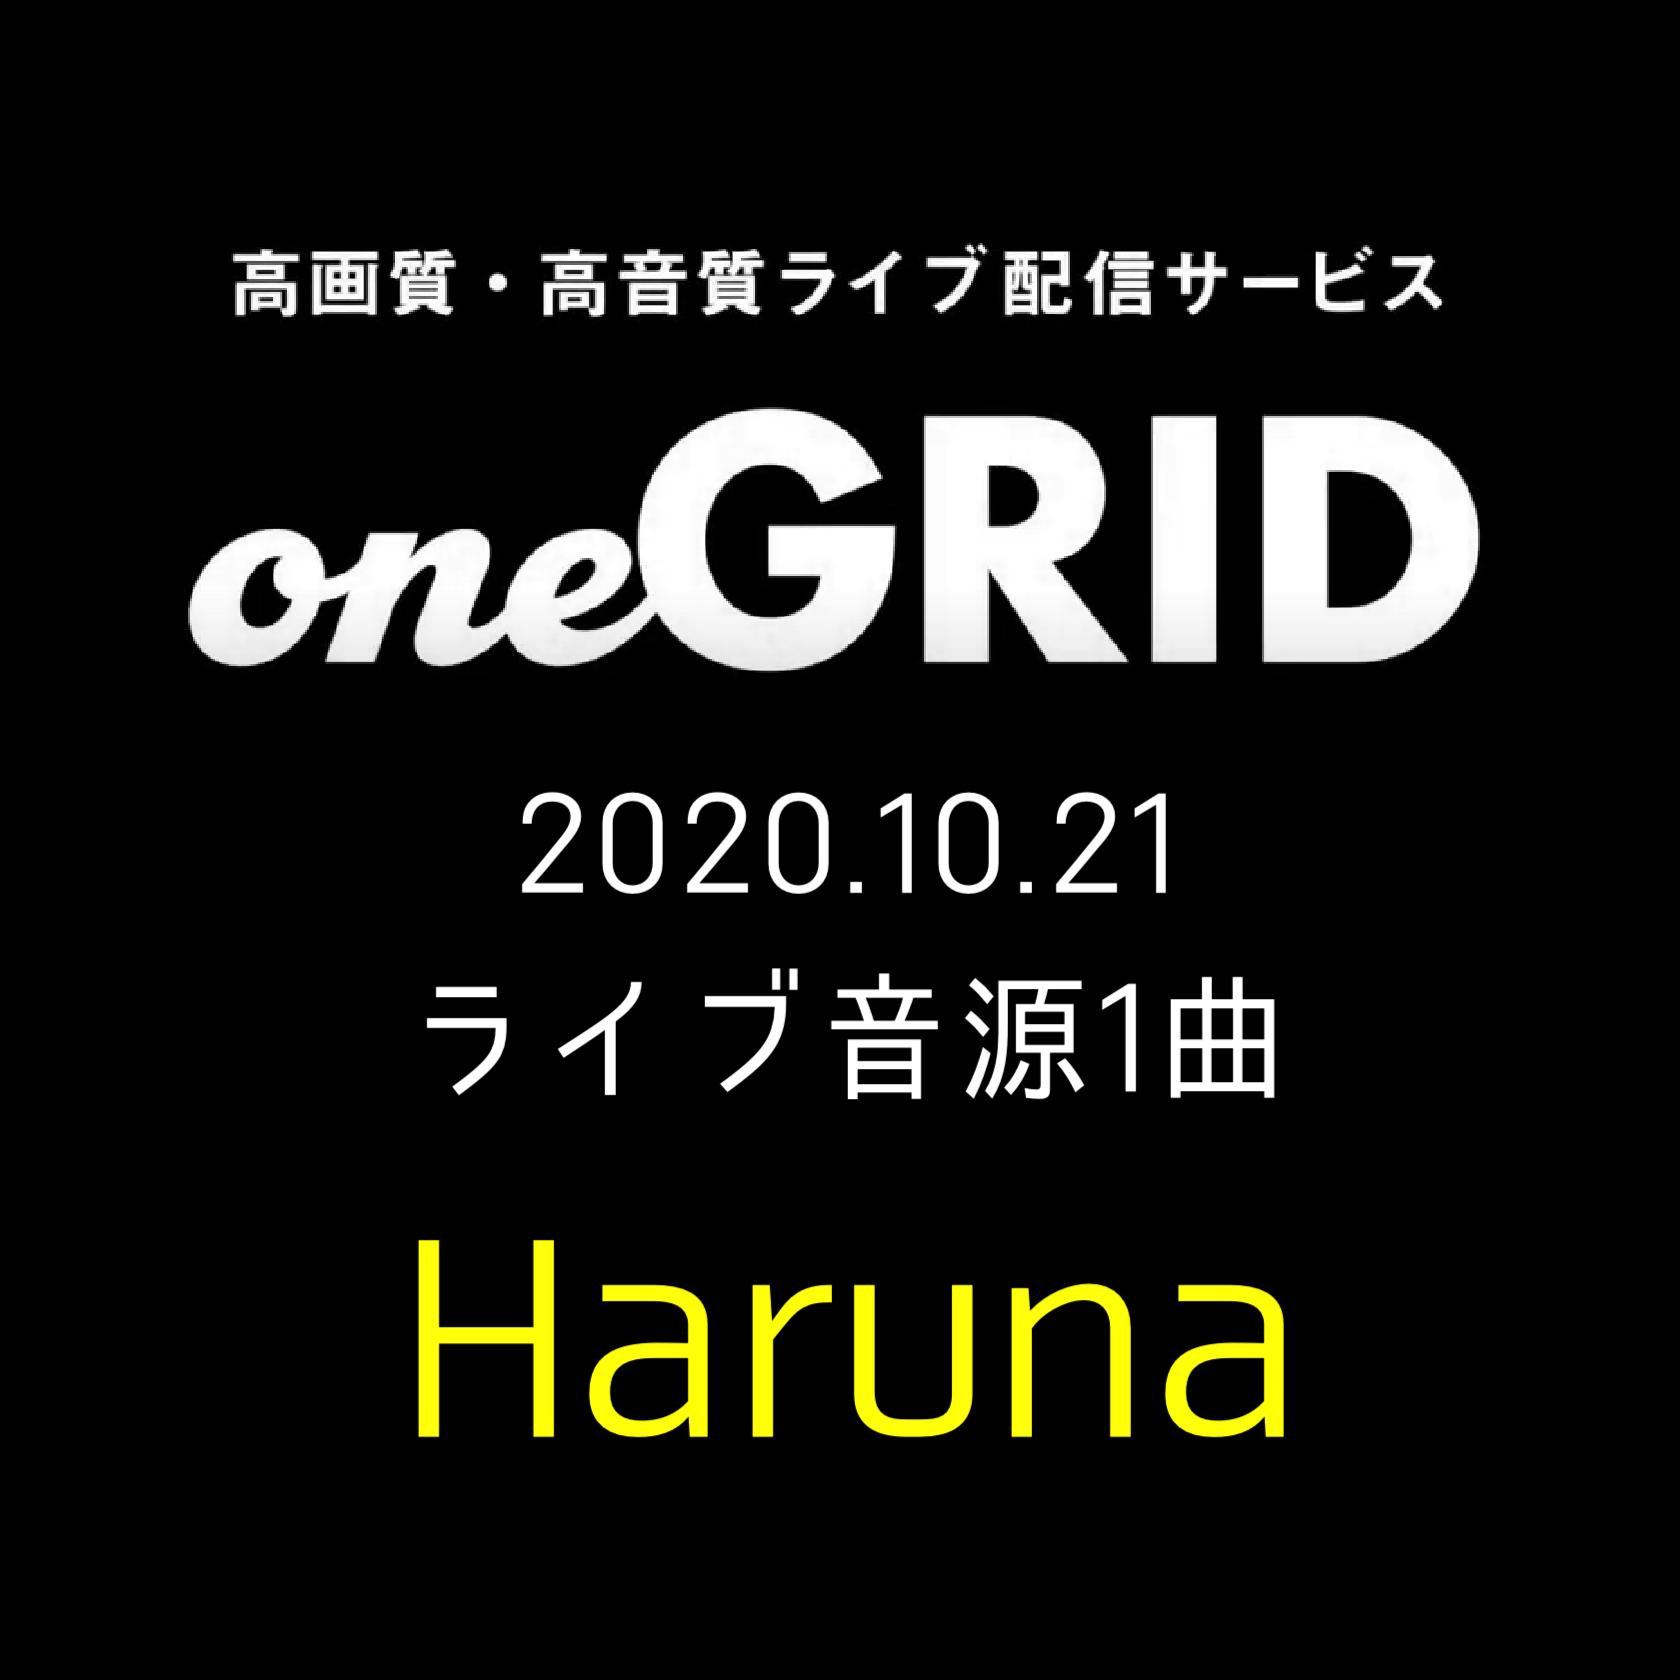 10/21 Haruna ライブ音源